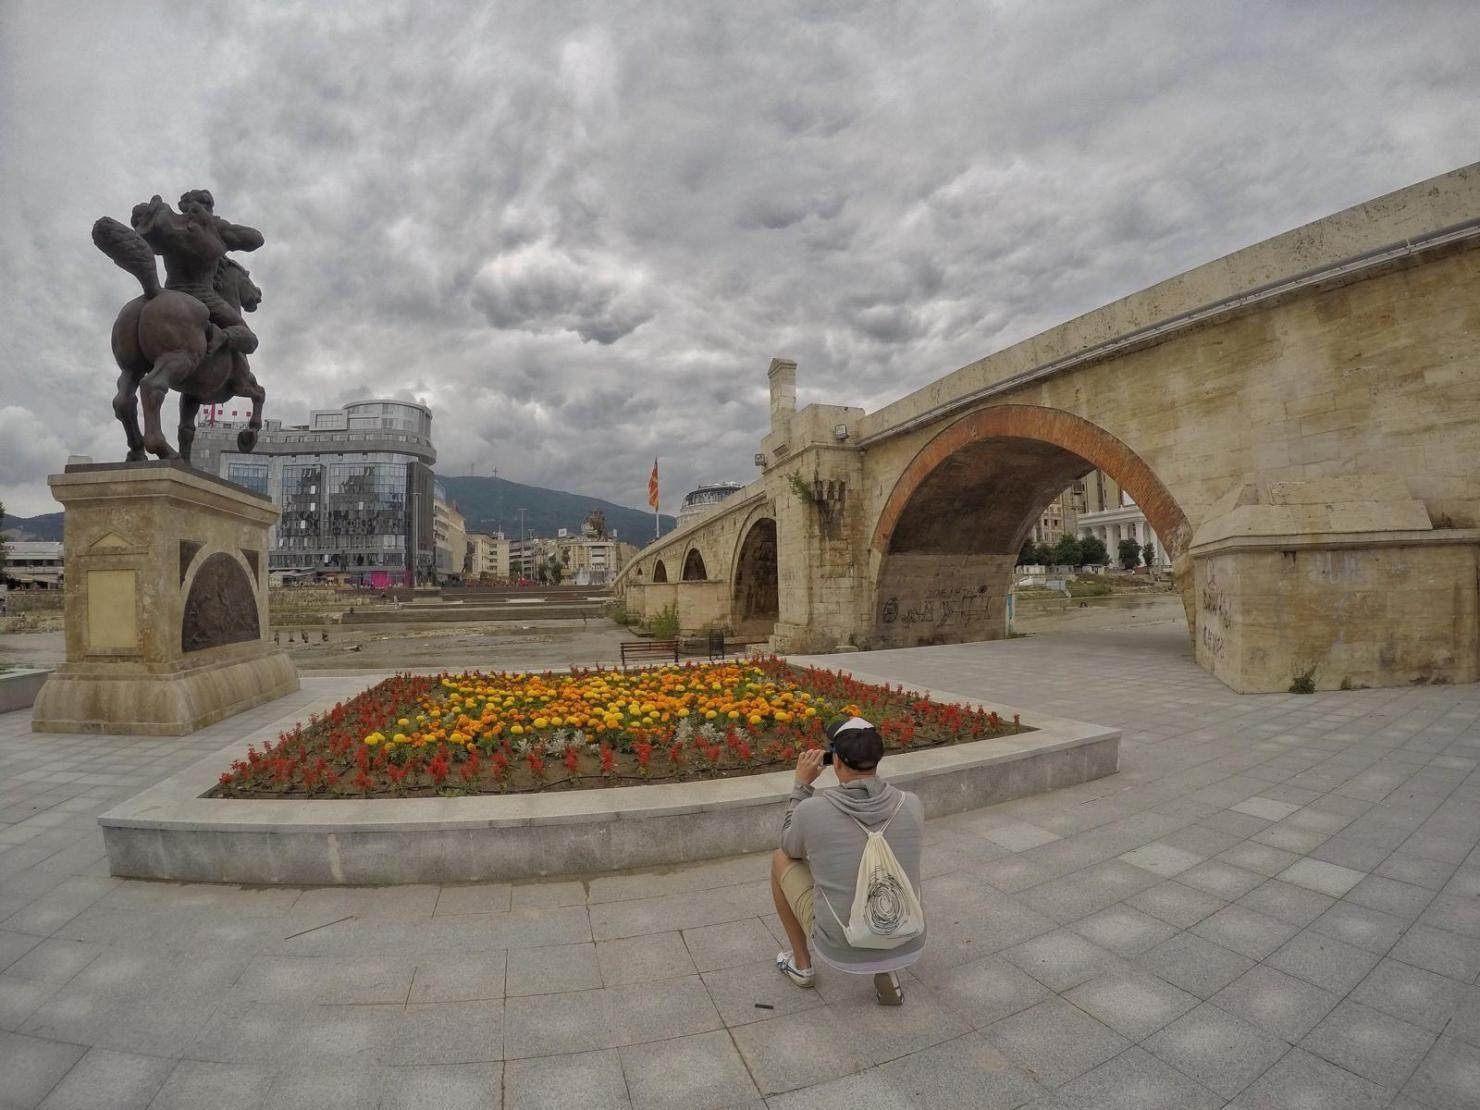 Langsam Reisen Dein Skopje Reiseguide In 2020 With Images